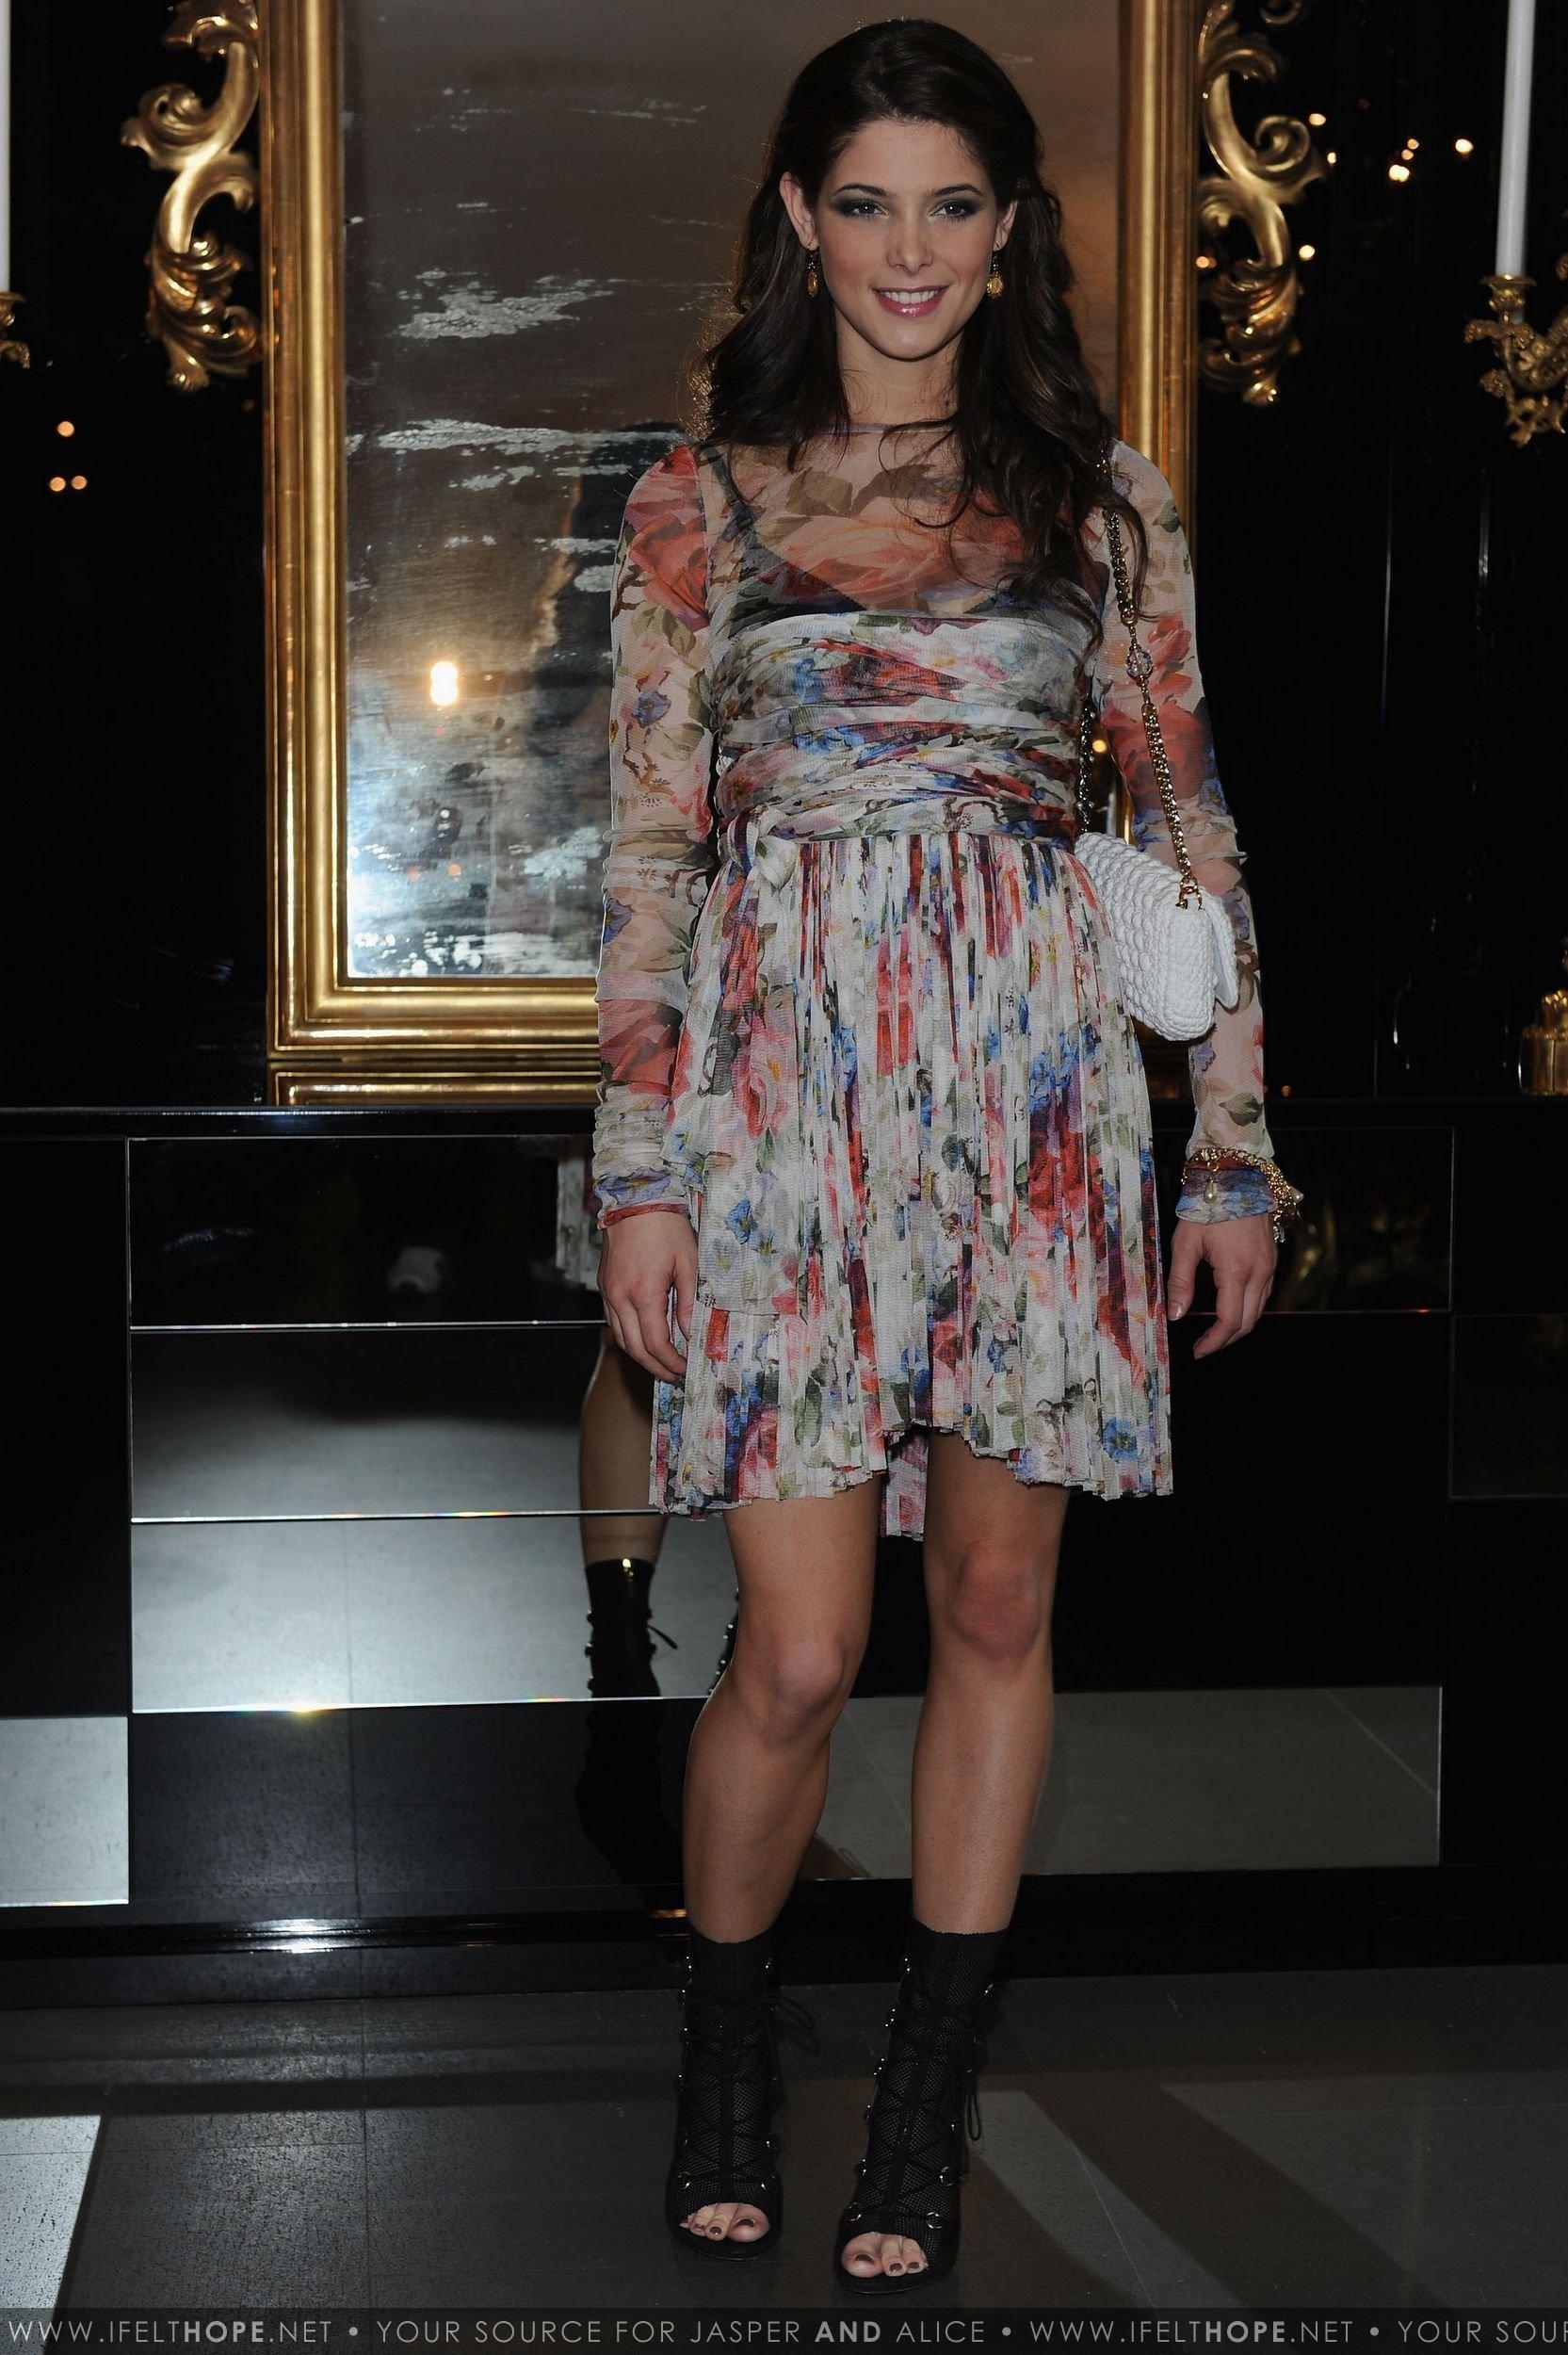 05470c960e5aa ashley greene images Dolce   Gabbana  Milan Fashion Week Womenswear -  February 28 HD wallpaper and background photos